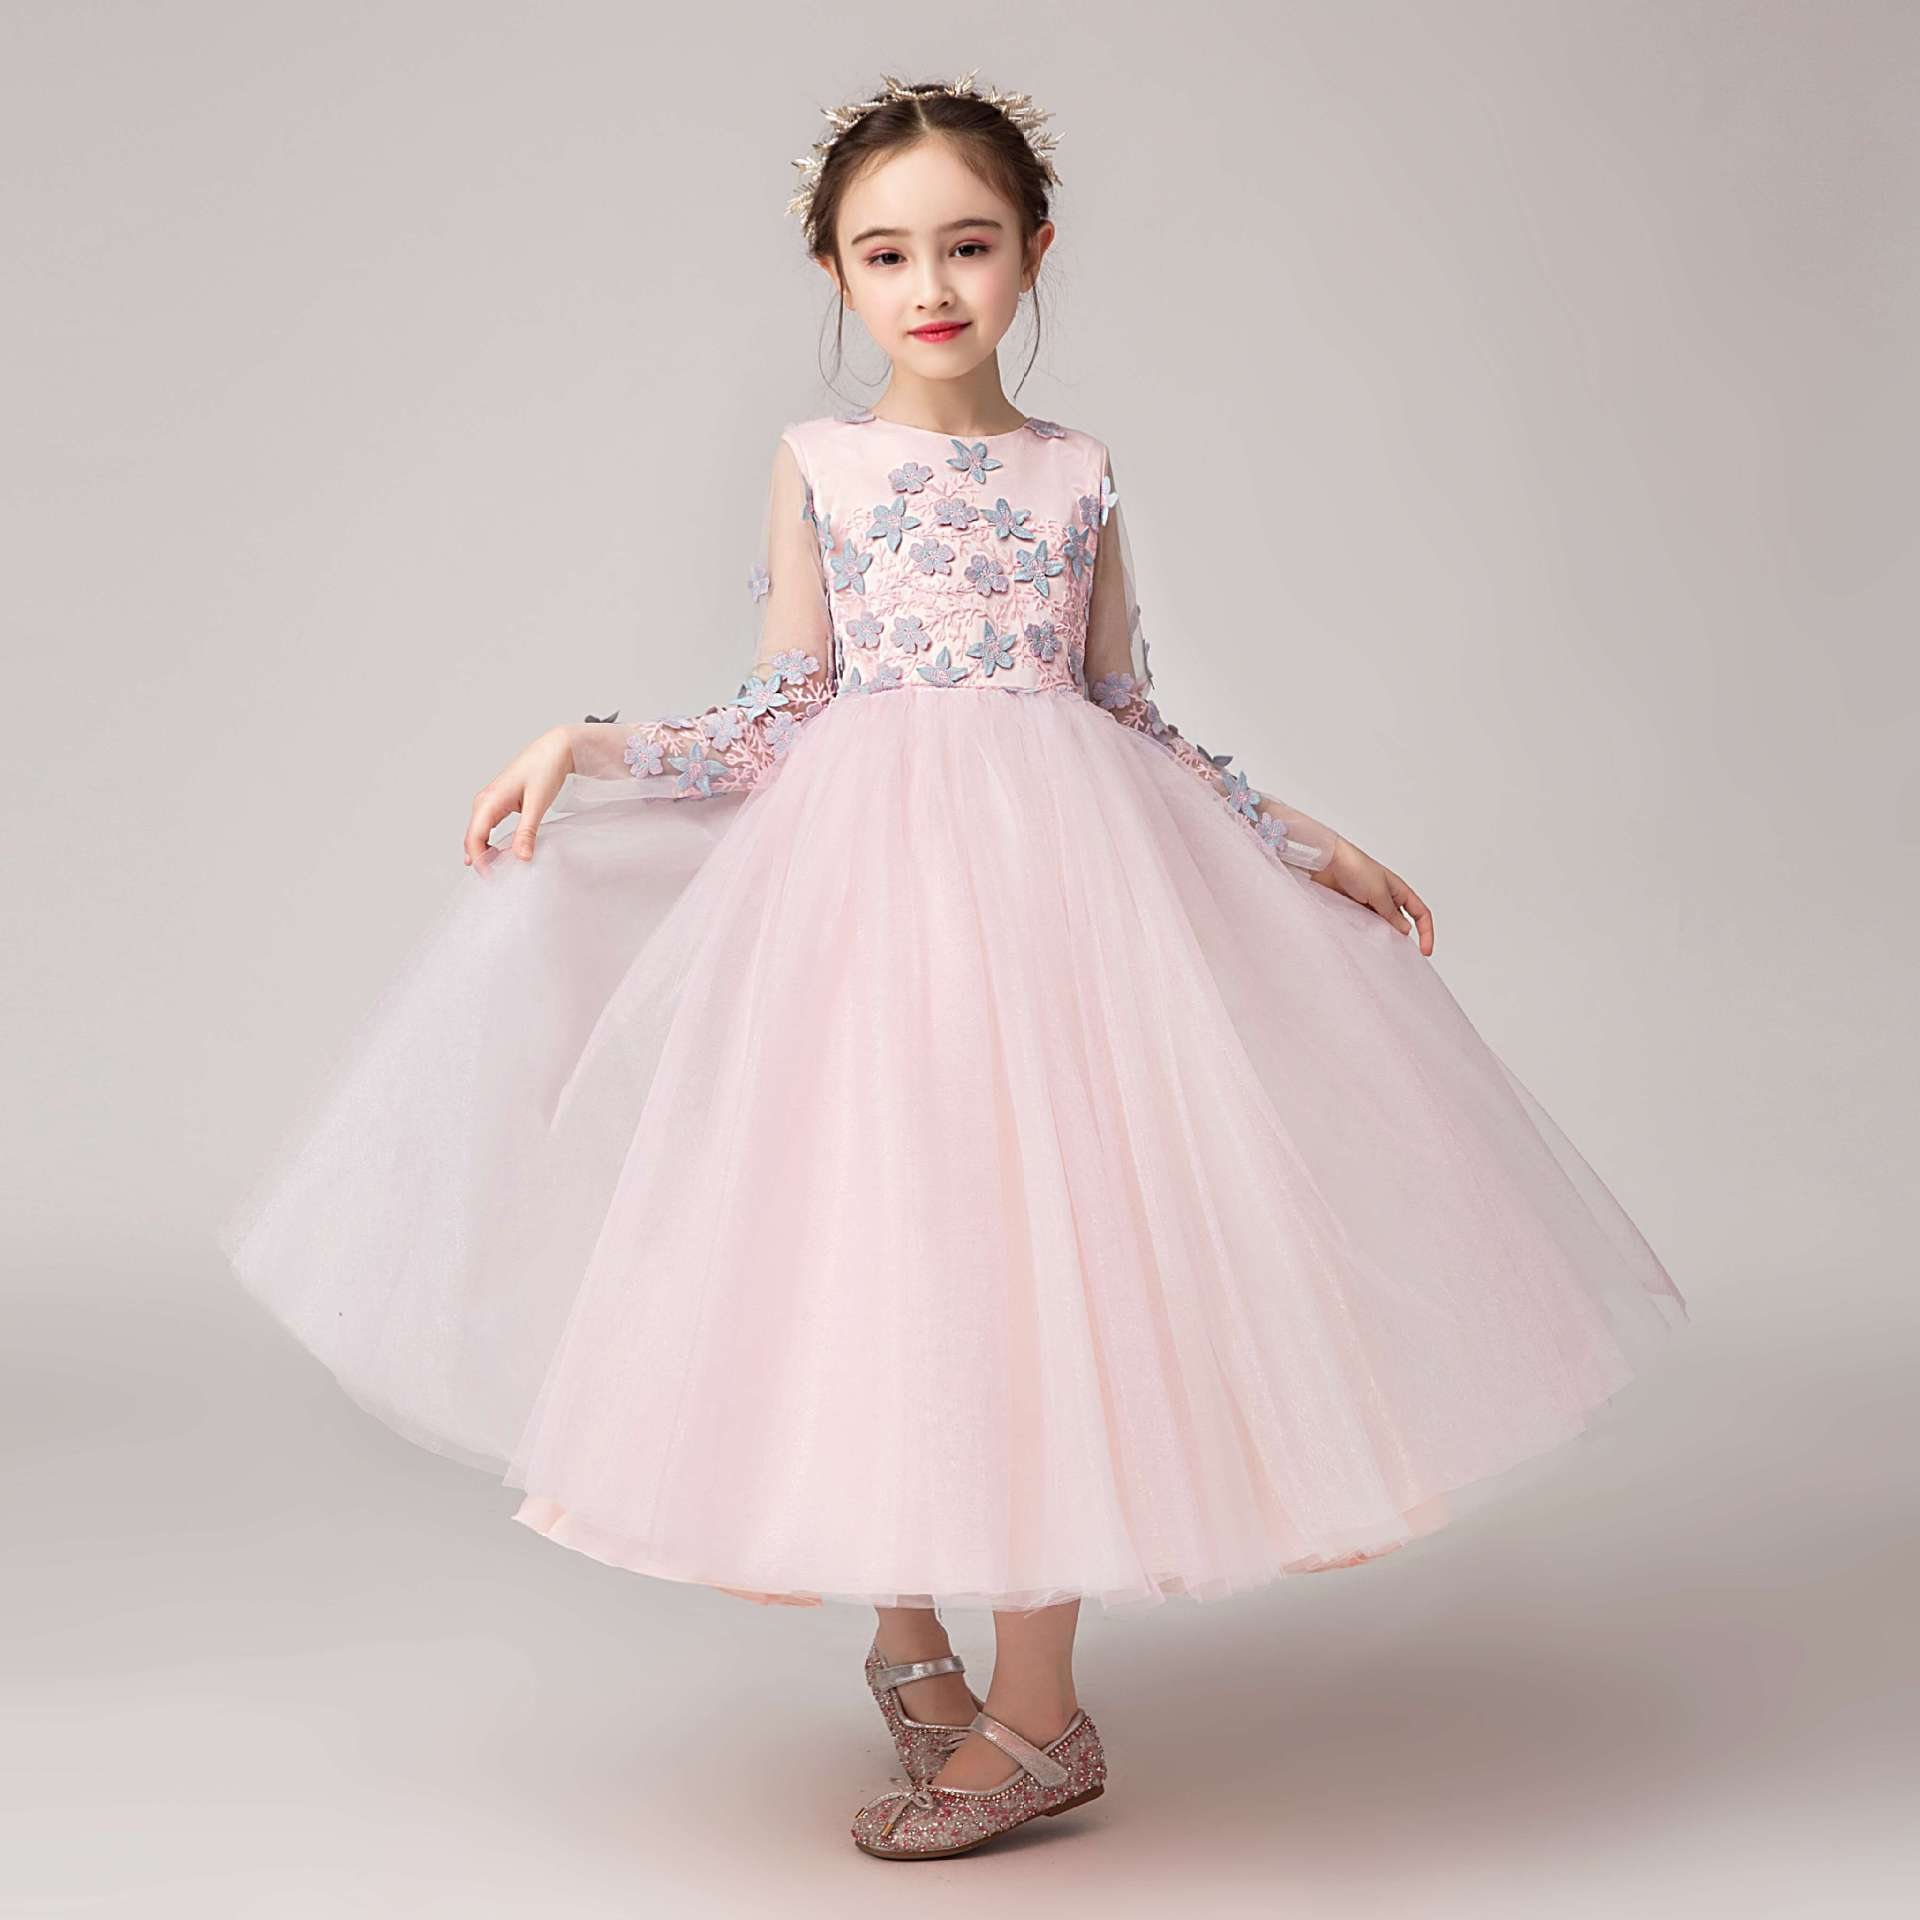 Vintage   Flower     Girl     Dresses   For Weddings Blush Pink Custom Made Princess Tutu Appliqued Lace Bow Kids First Communio   Dress